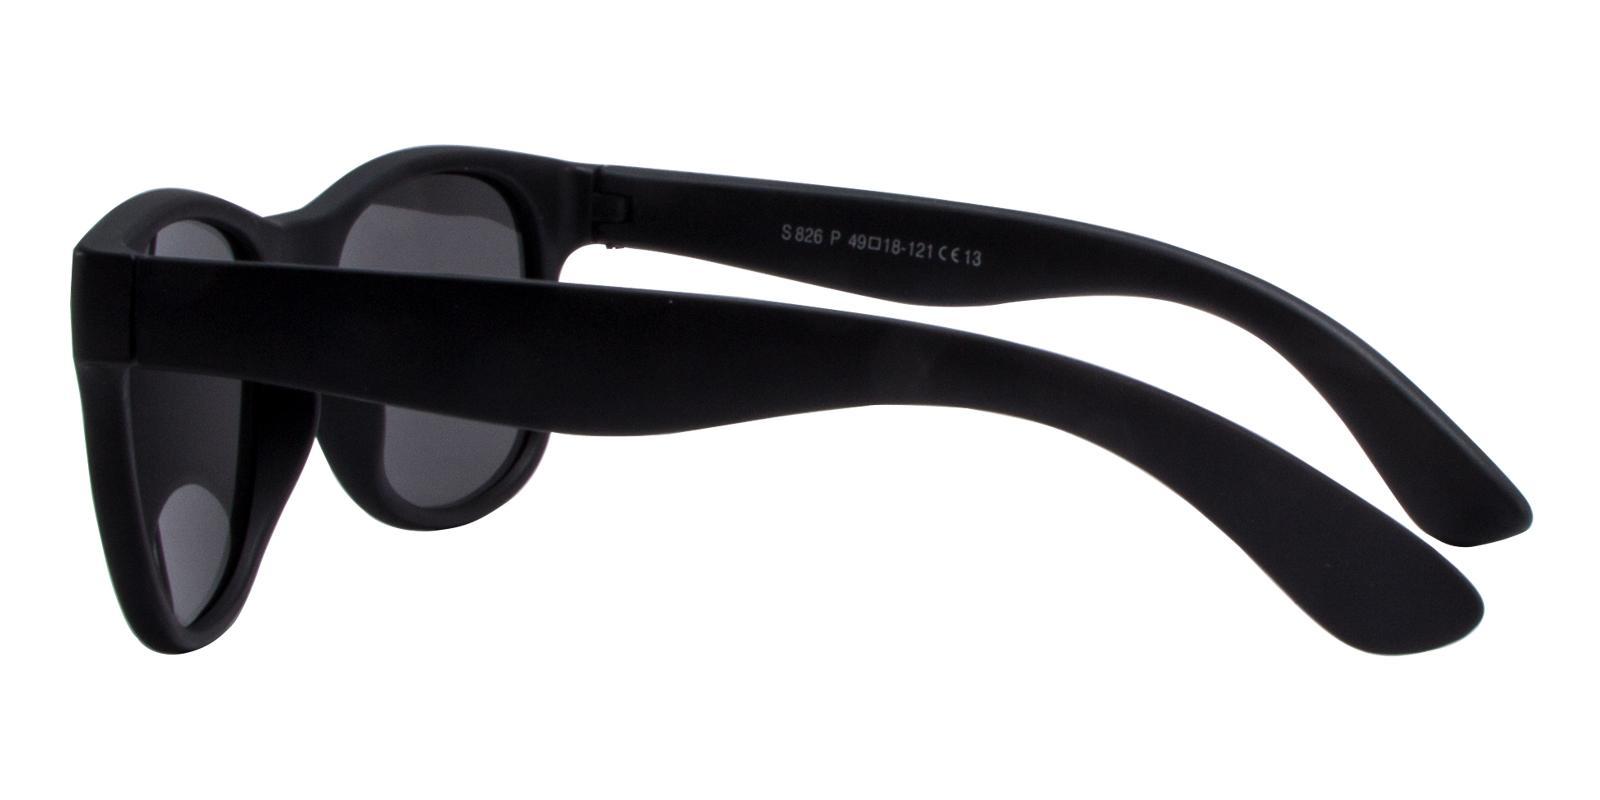 Obsid Black TR Sunglasses , UniversalBridgeFit Frames from ABBE Glasses